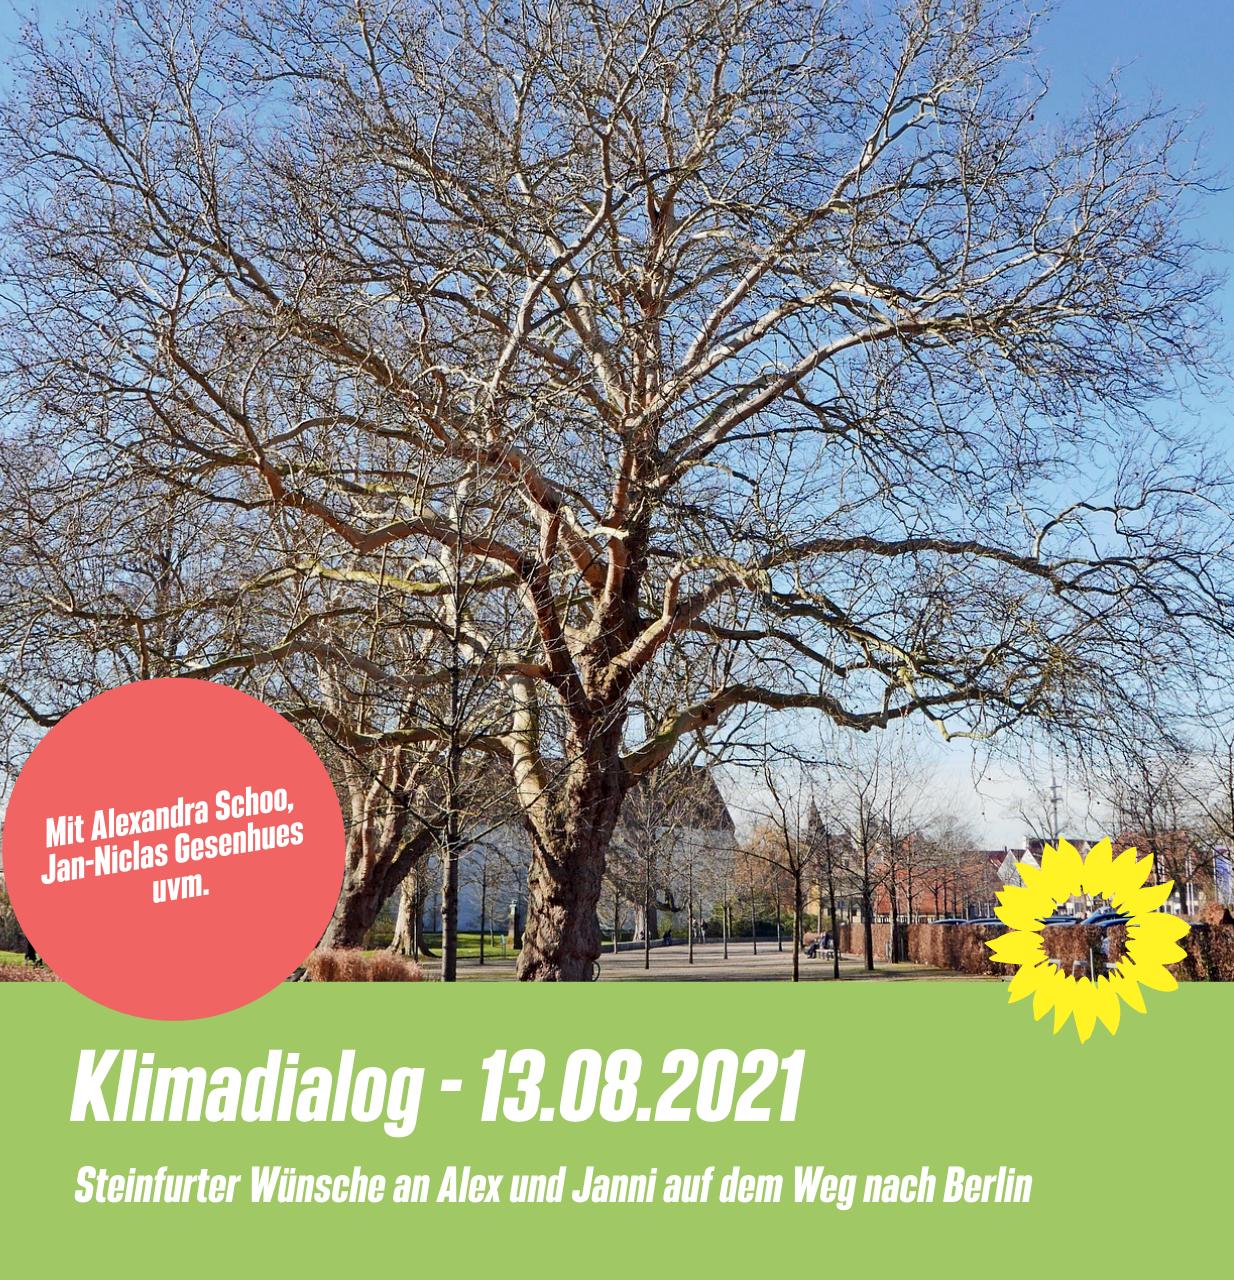 Steinfurter Klimadialog – Save the date 13.08.2021